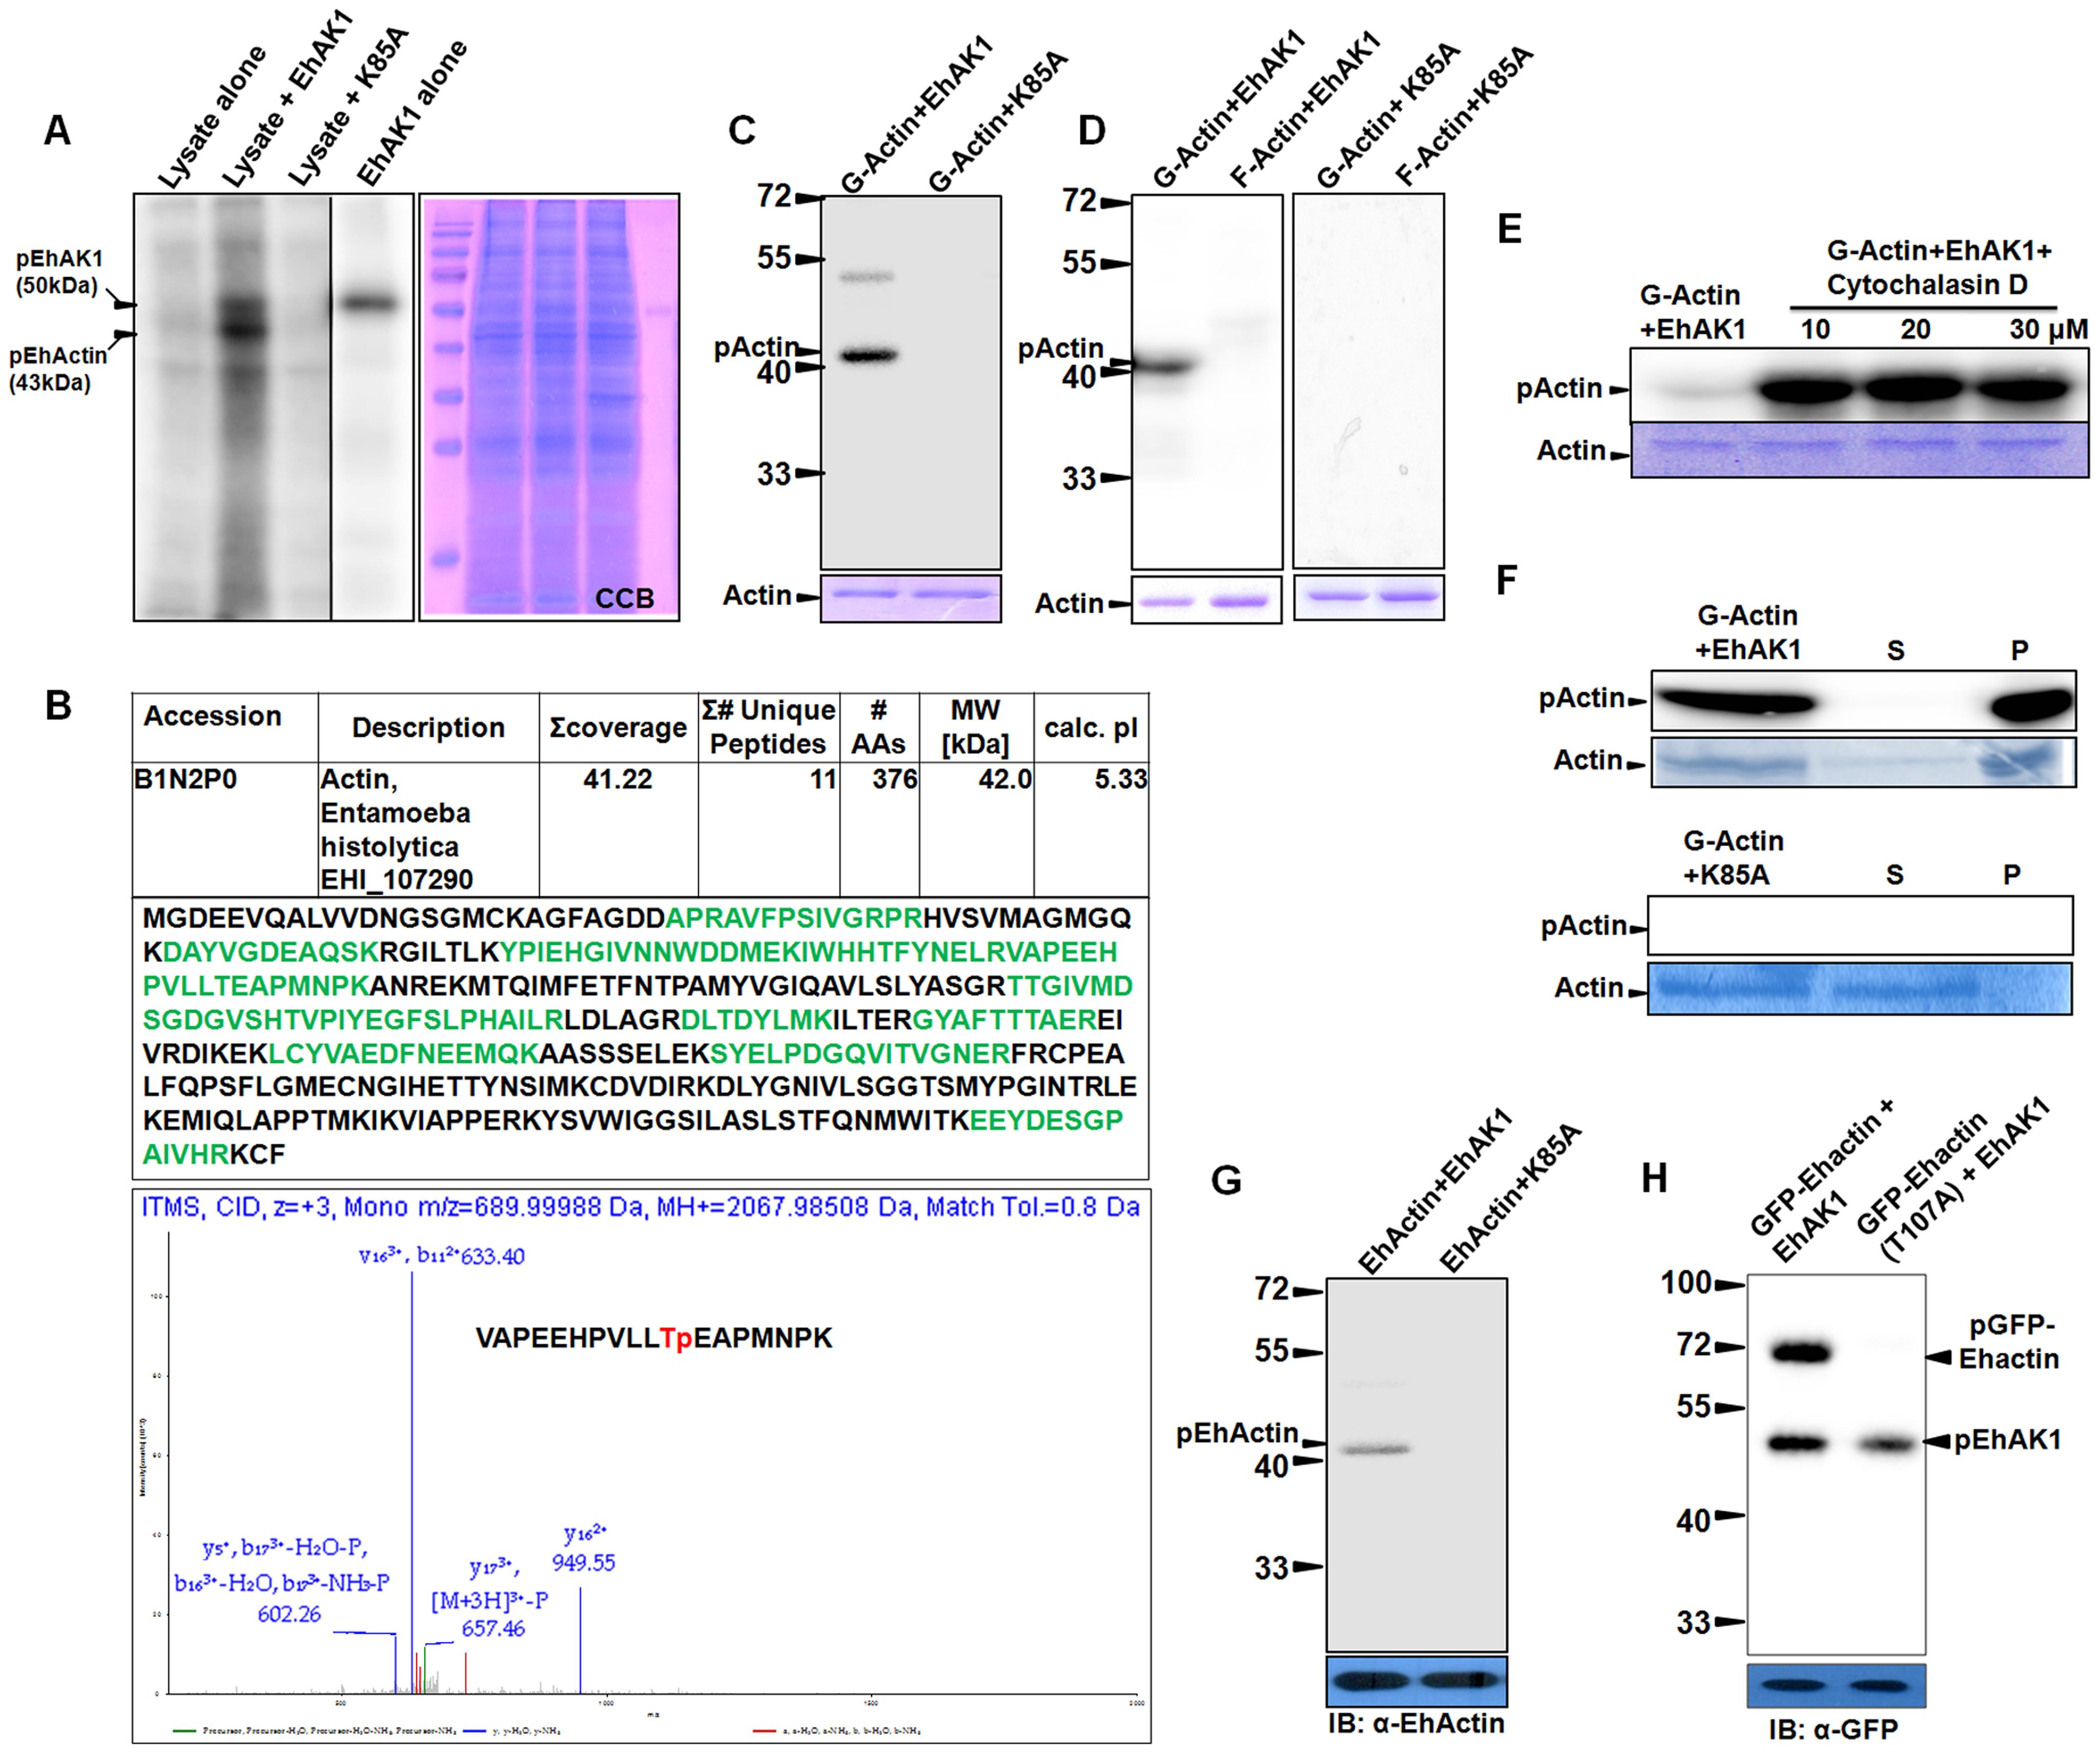 EhAK1 phosphorylates G-actin at threonine 107.